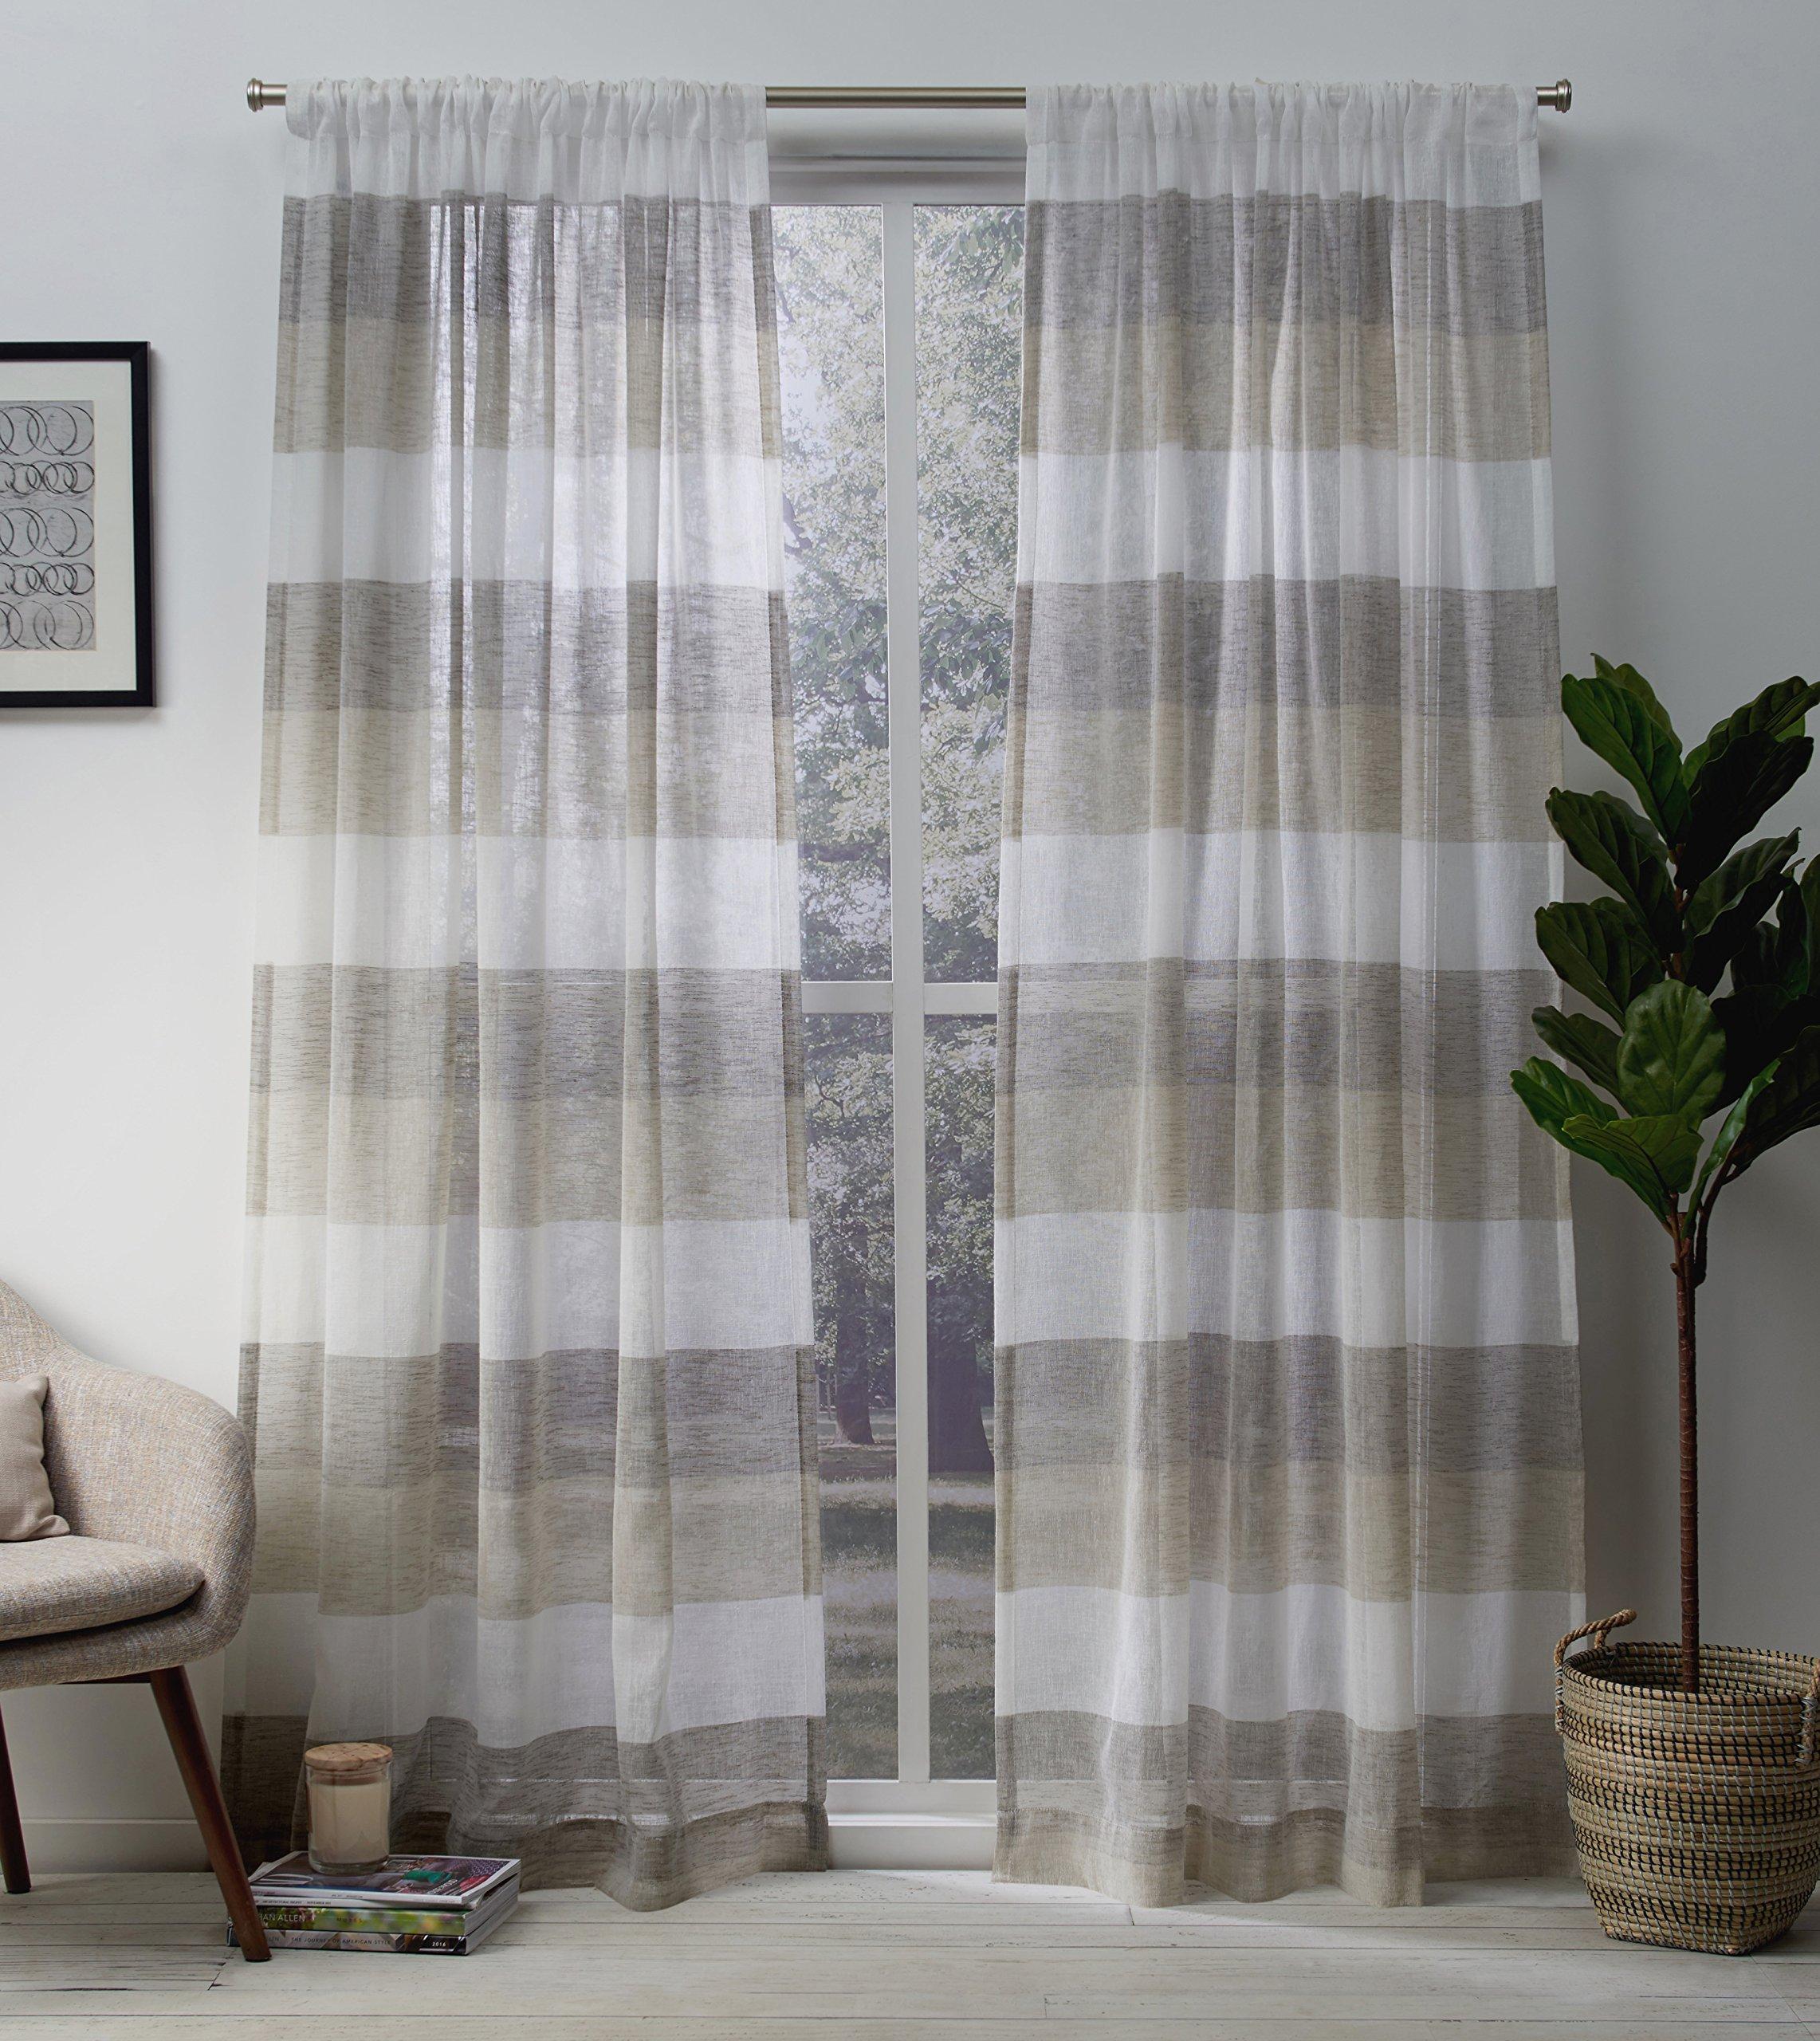 Burlap And Lace Curtains: Amazon.com